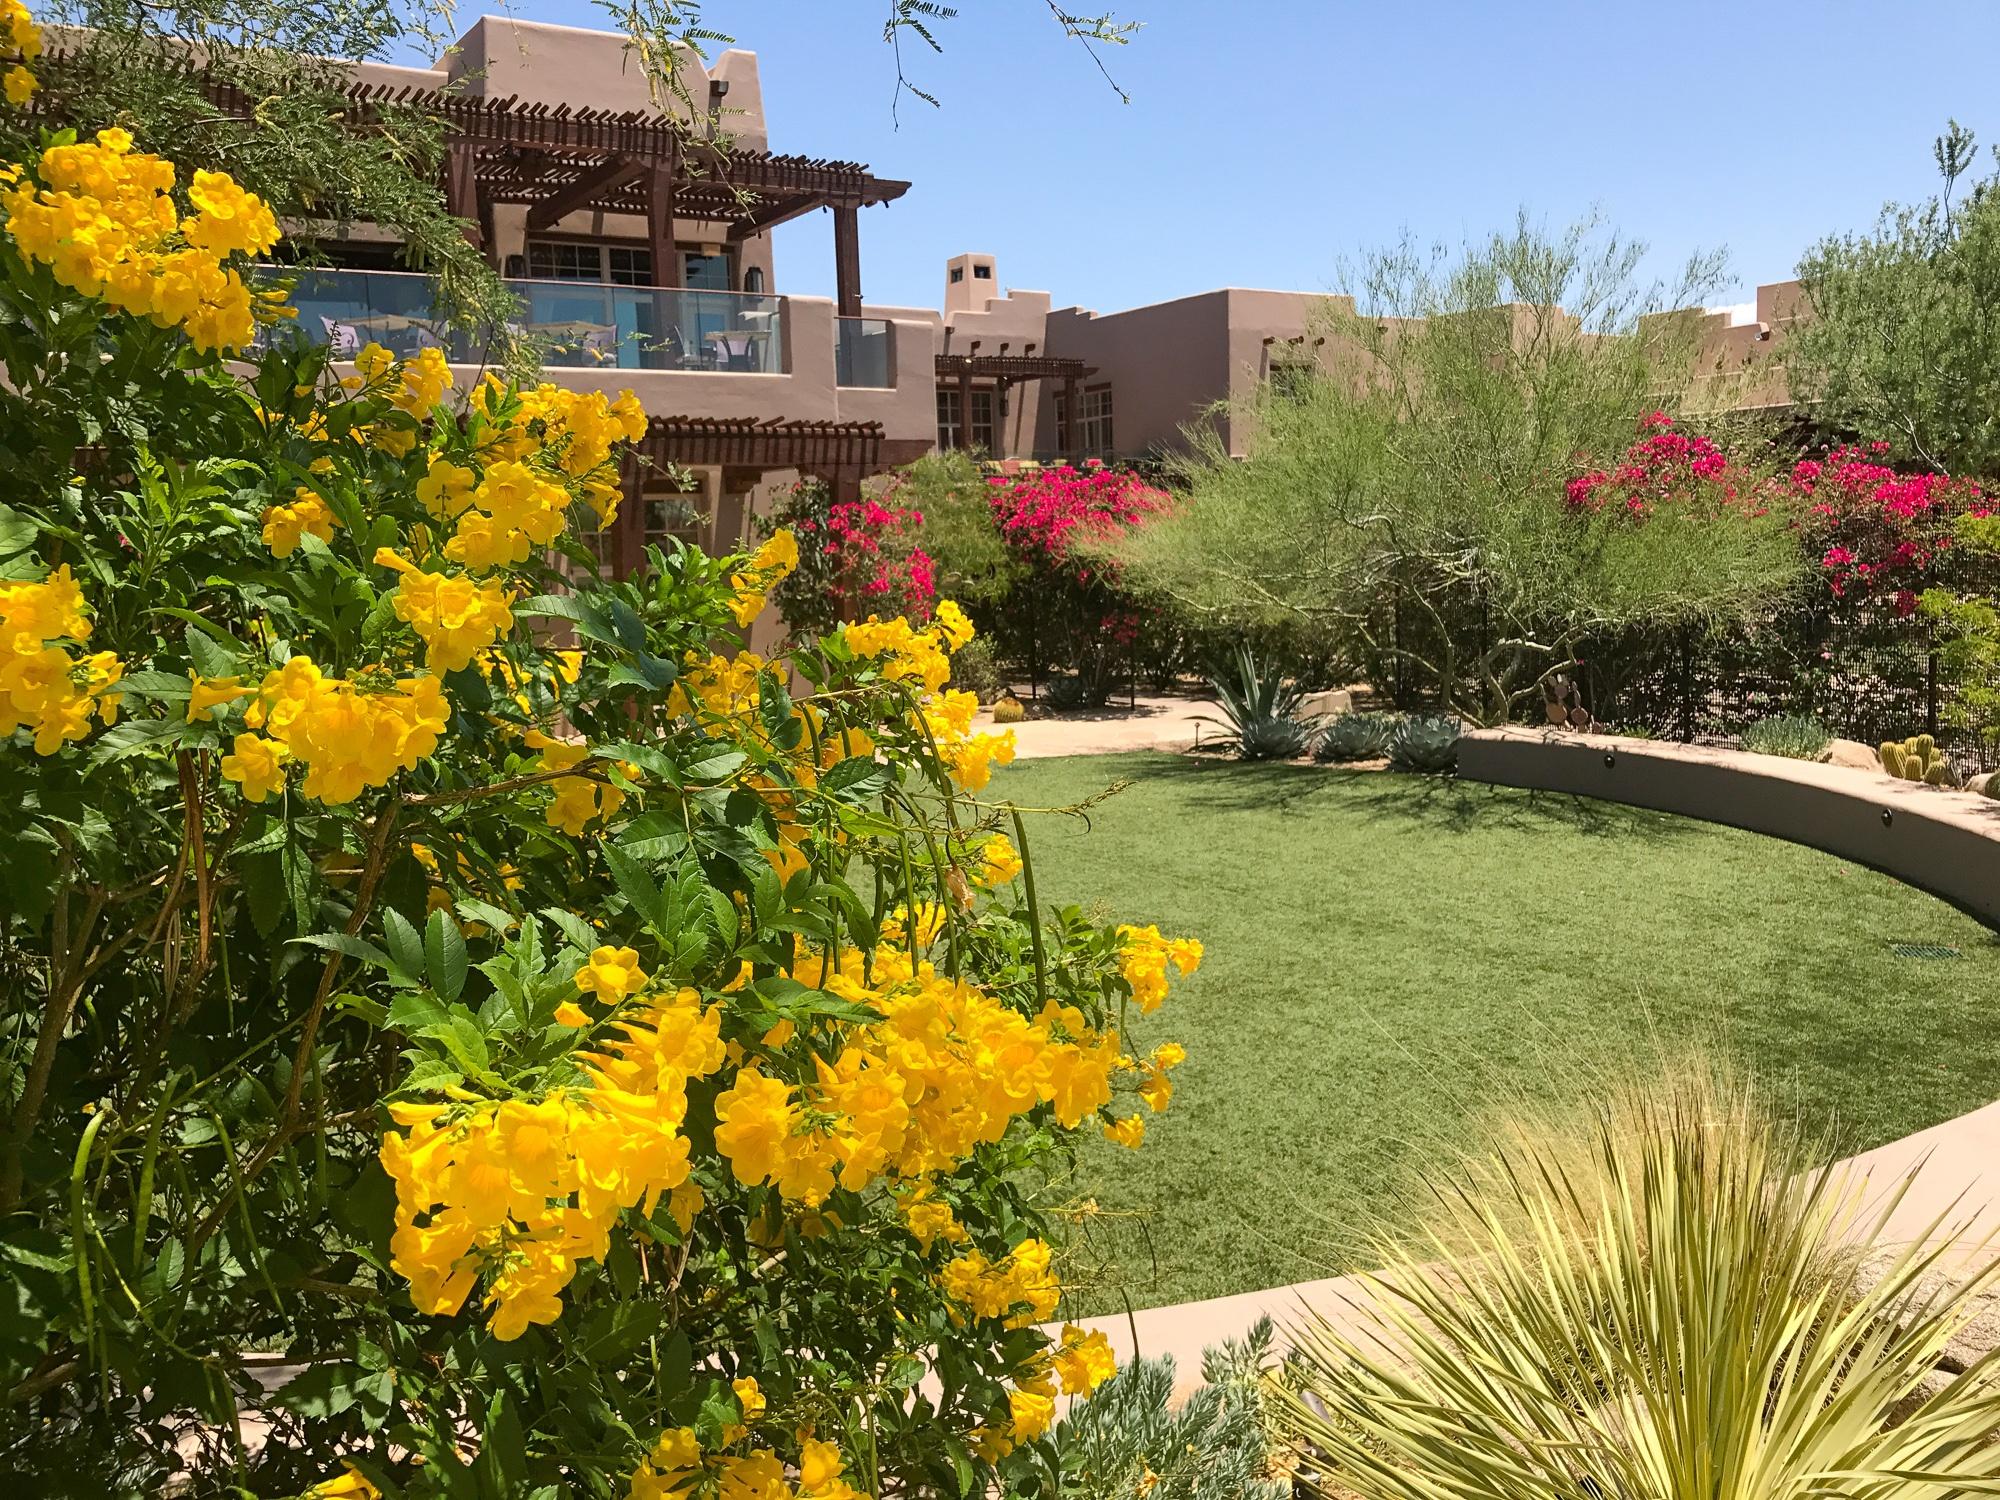 Beautiful grounds at Four Seasons Scottsdale